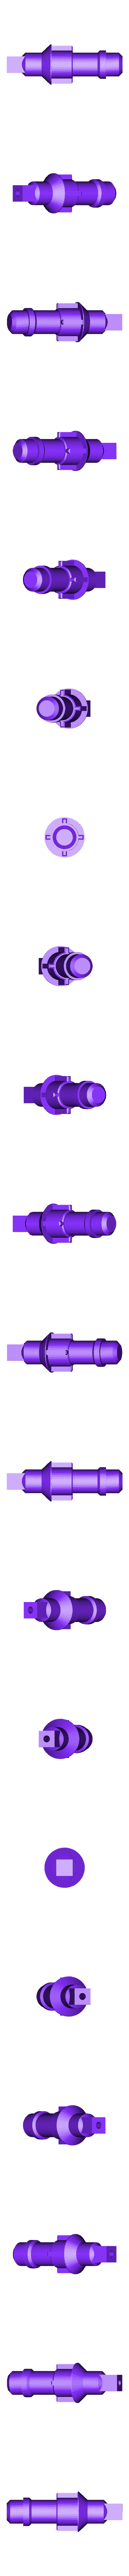 TruckV3_GearboxV3A_gear3A.STL Download STL file 3D Printed RC Truck V3 • 3D print model, MrCrankyface